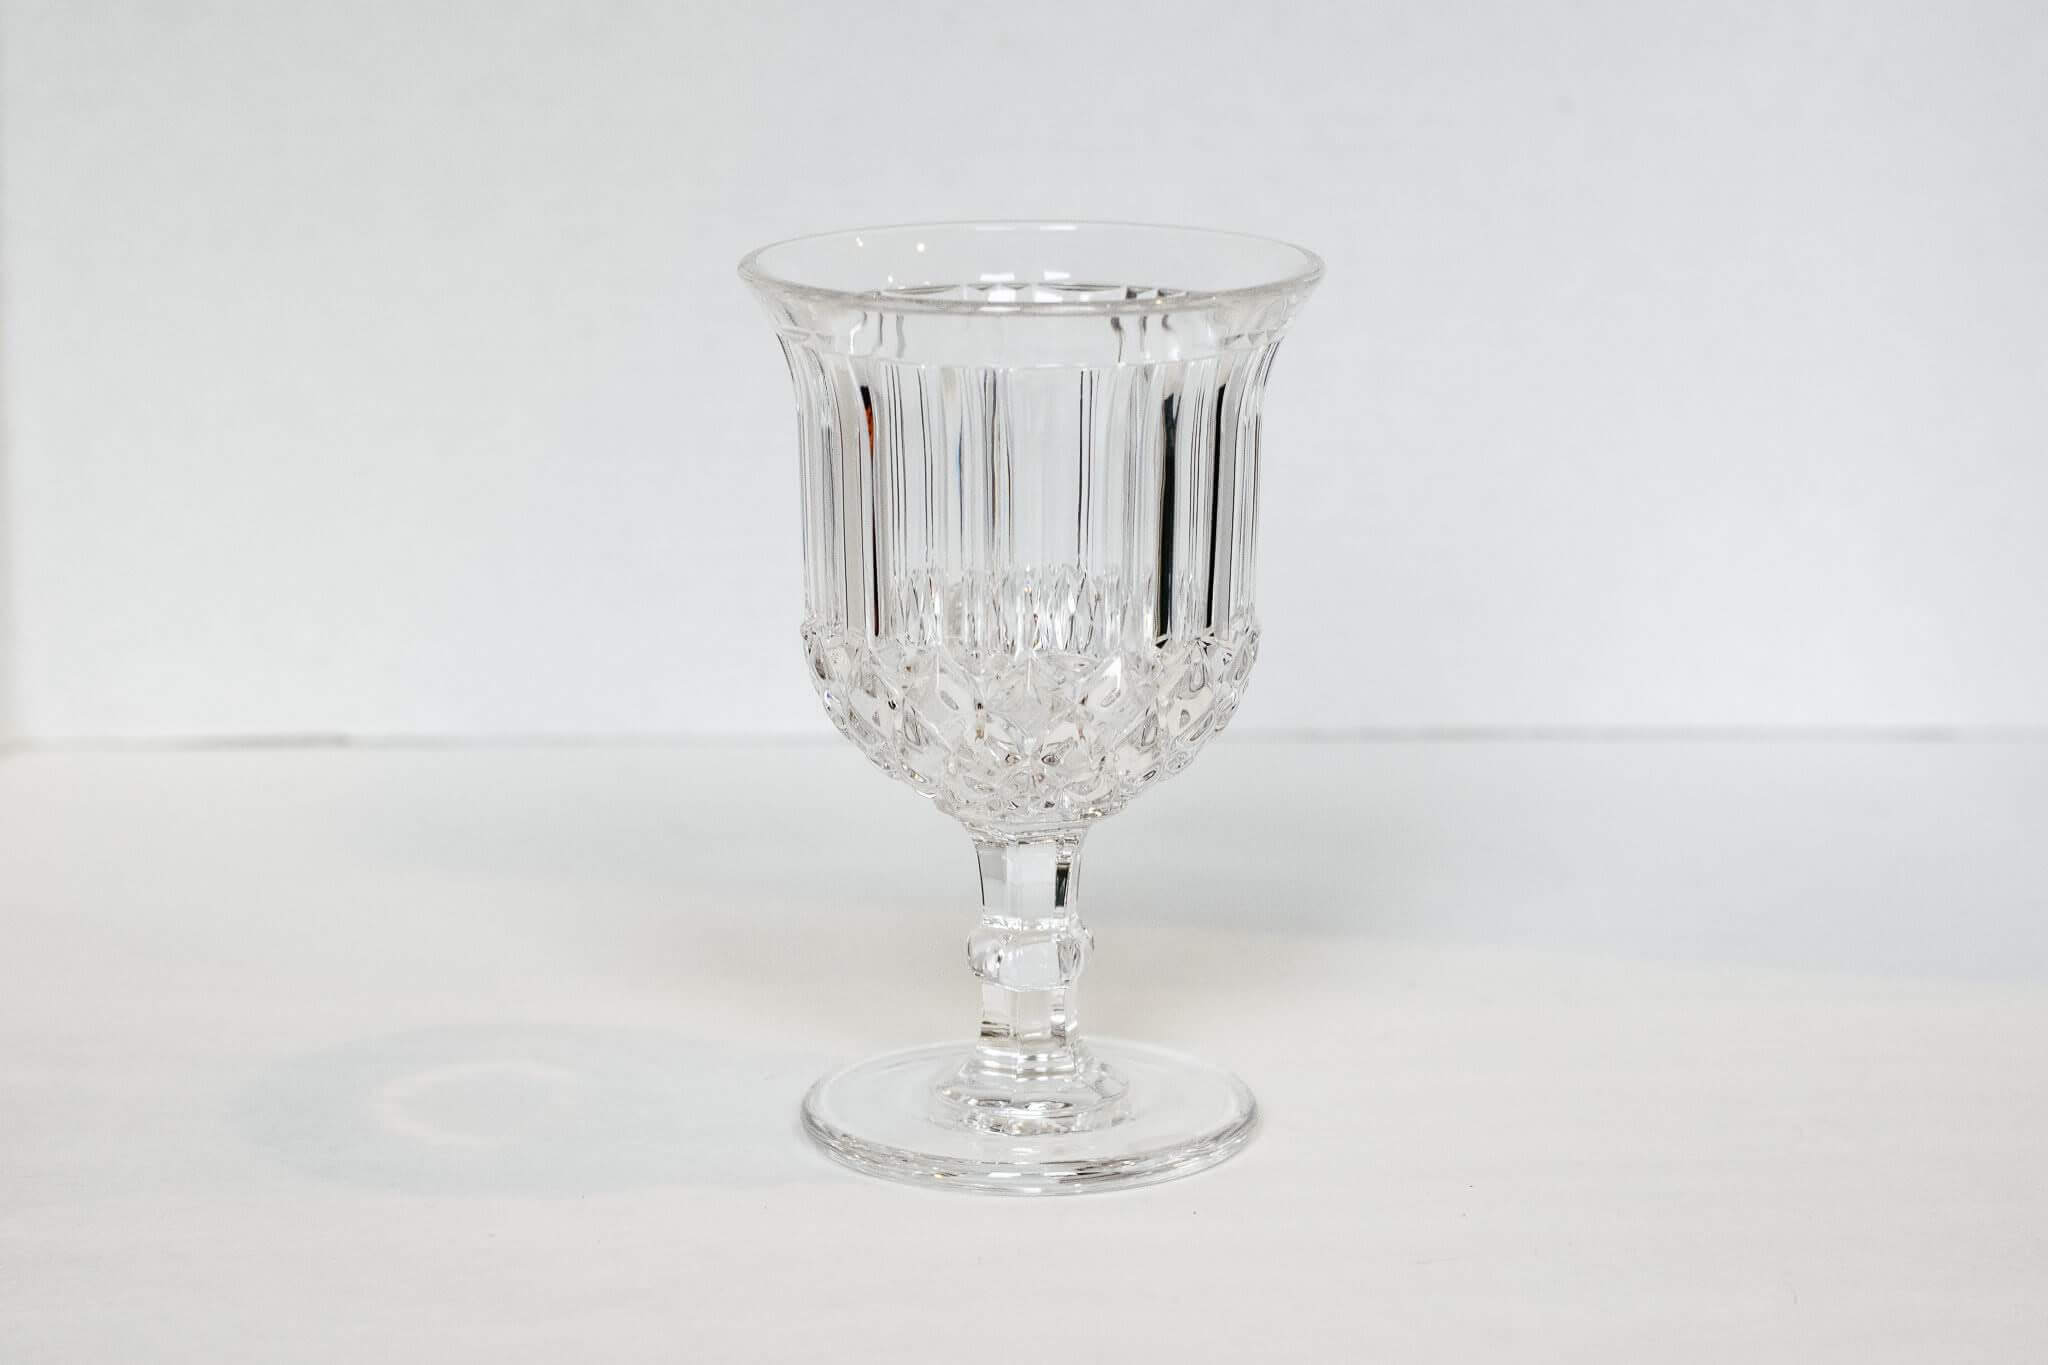 Glassware-19.jpg